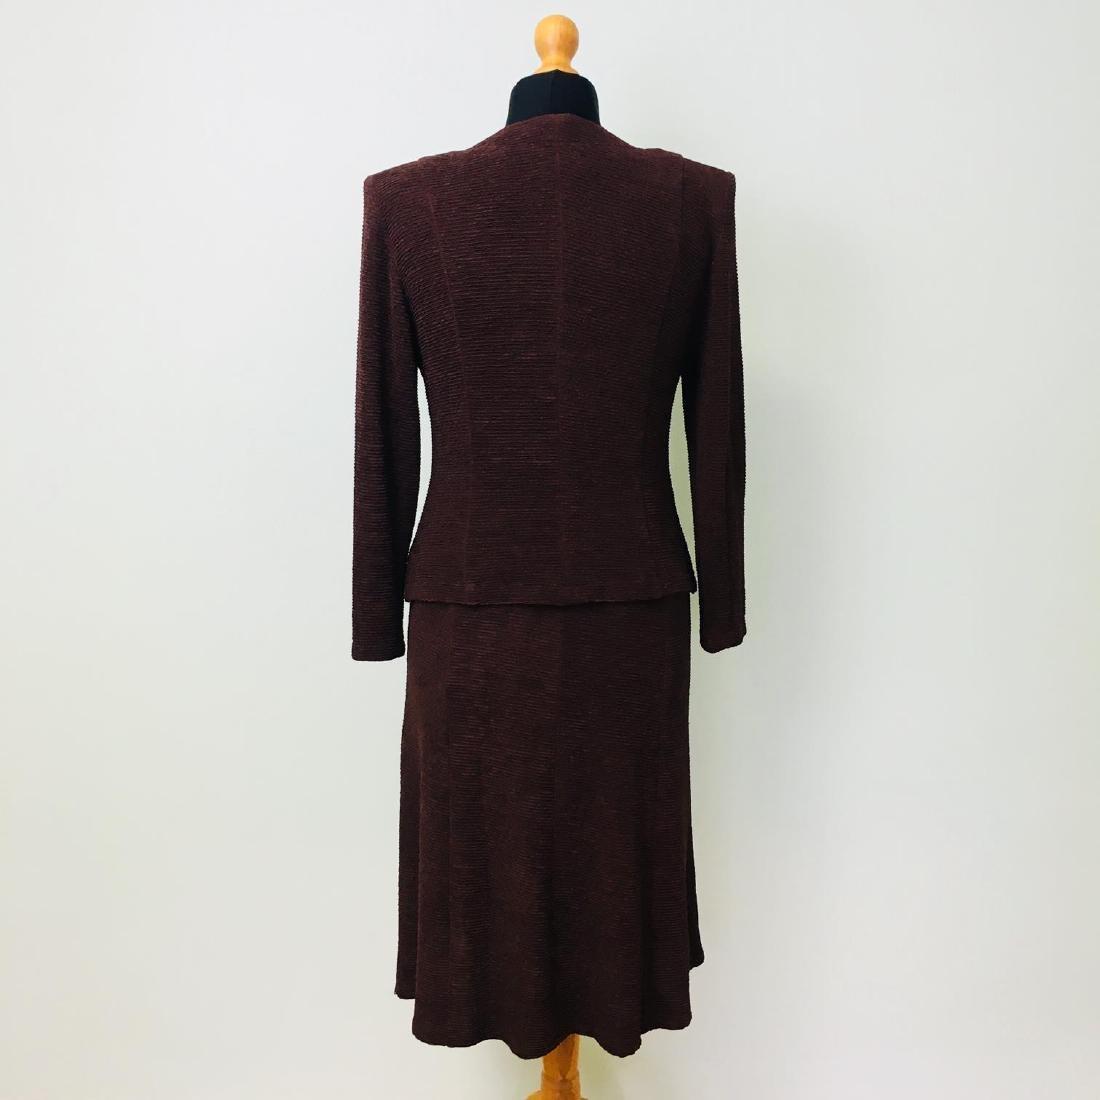 Vintage Women's 2 Piece Evening Jacket Dress Size M - 4